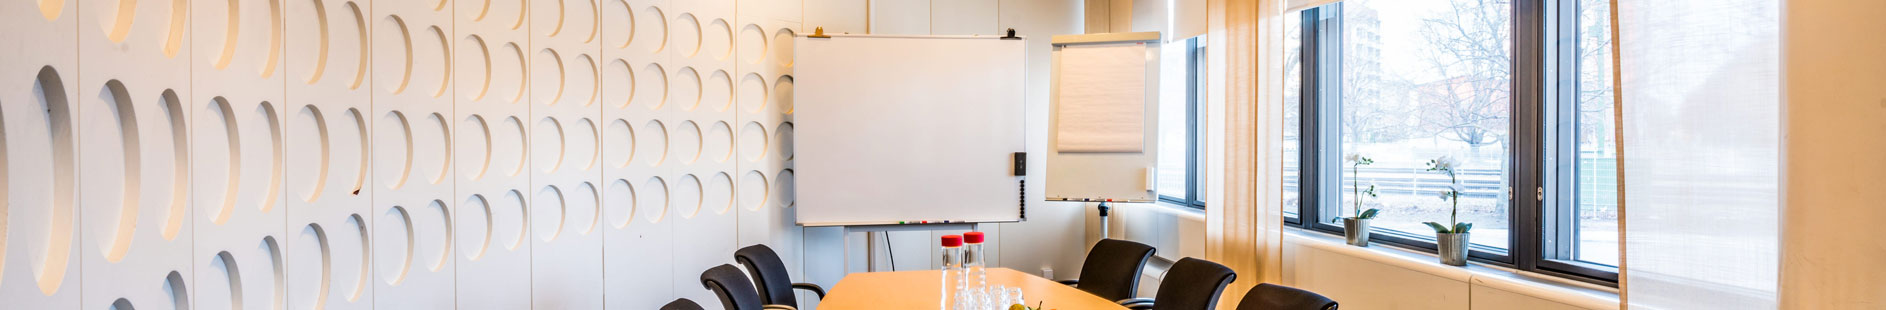 konferensanlaggningar.se